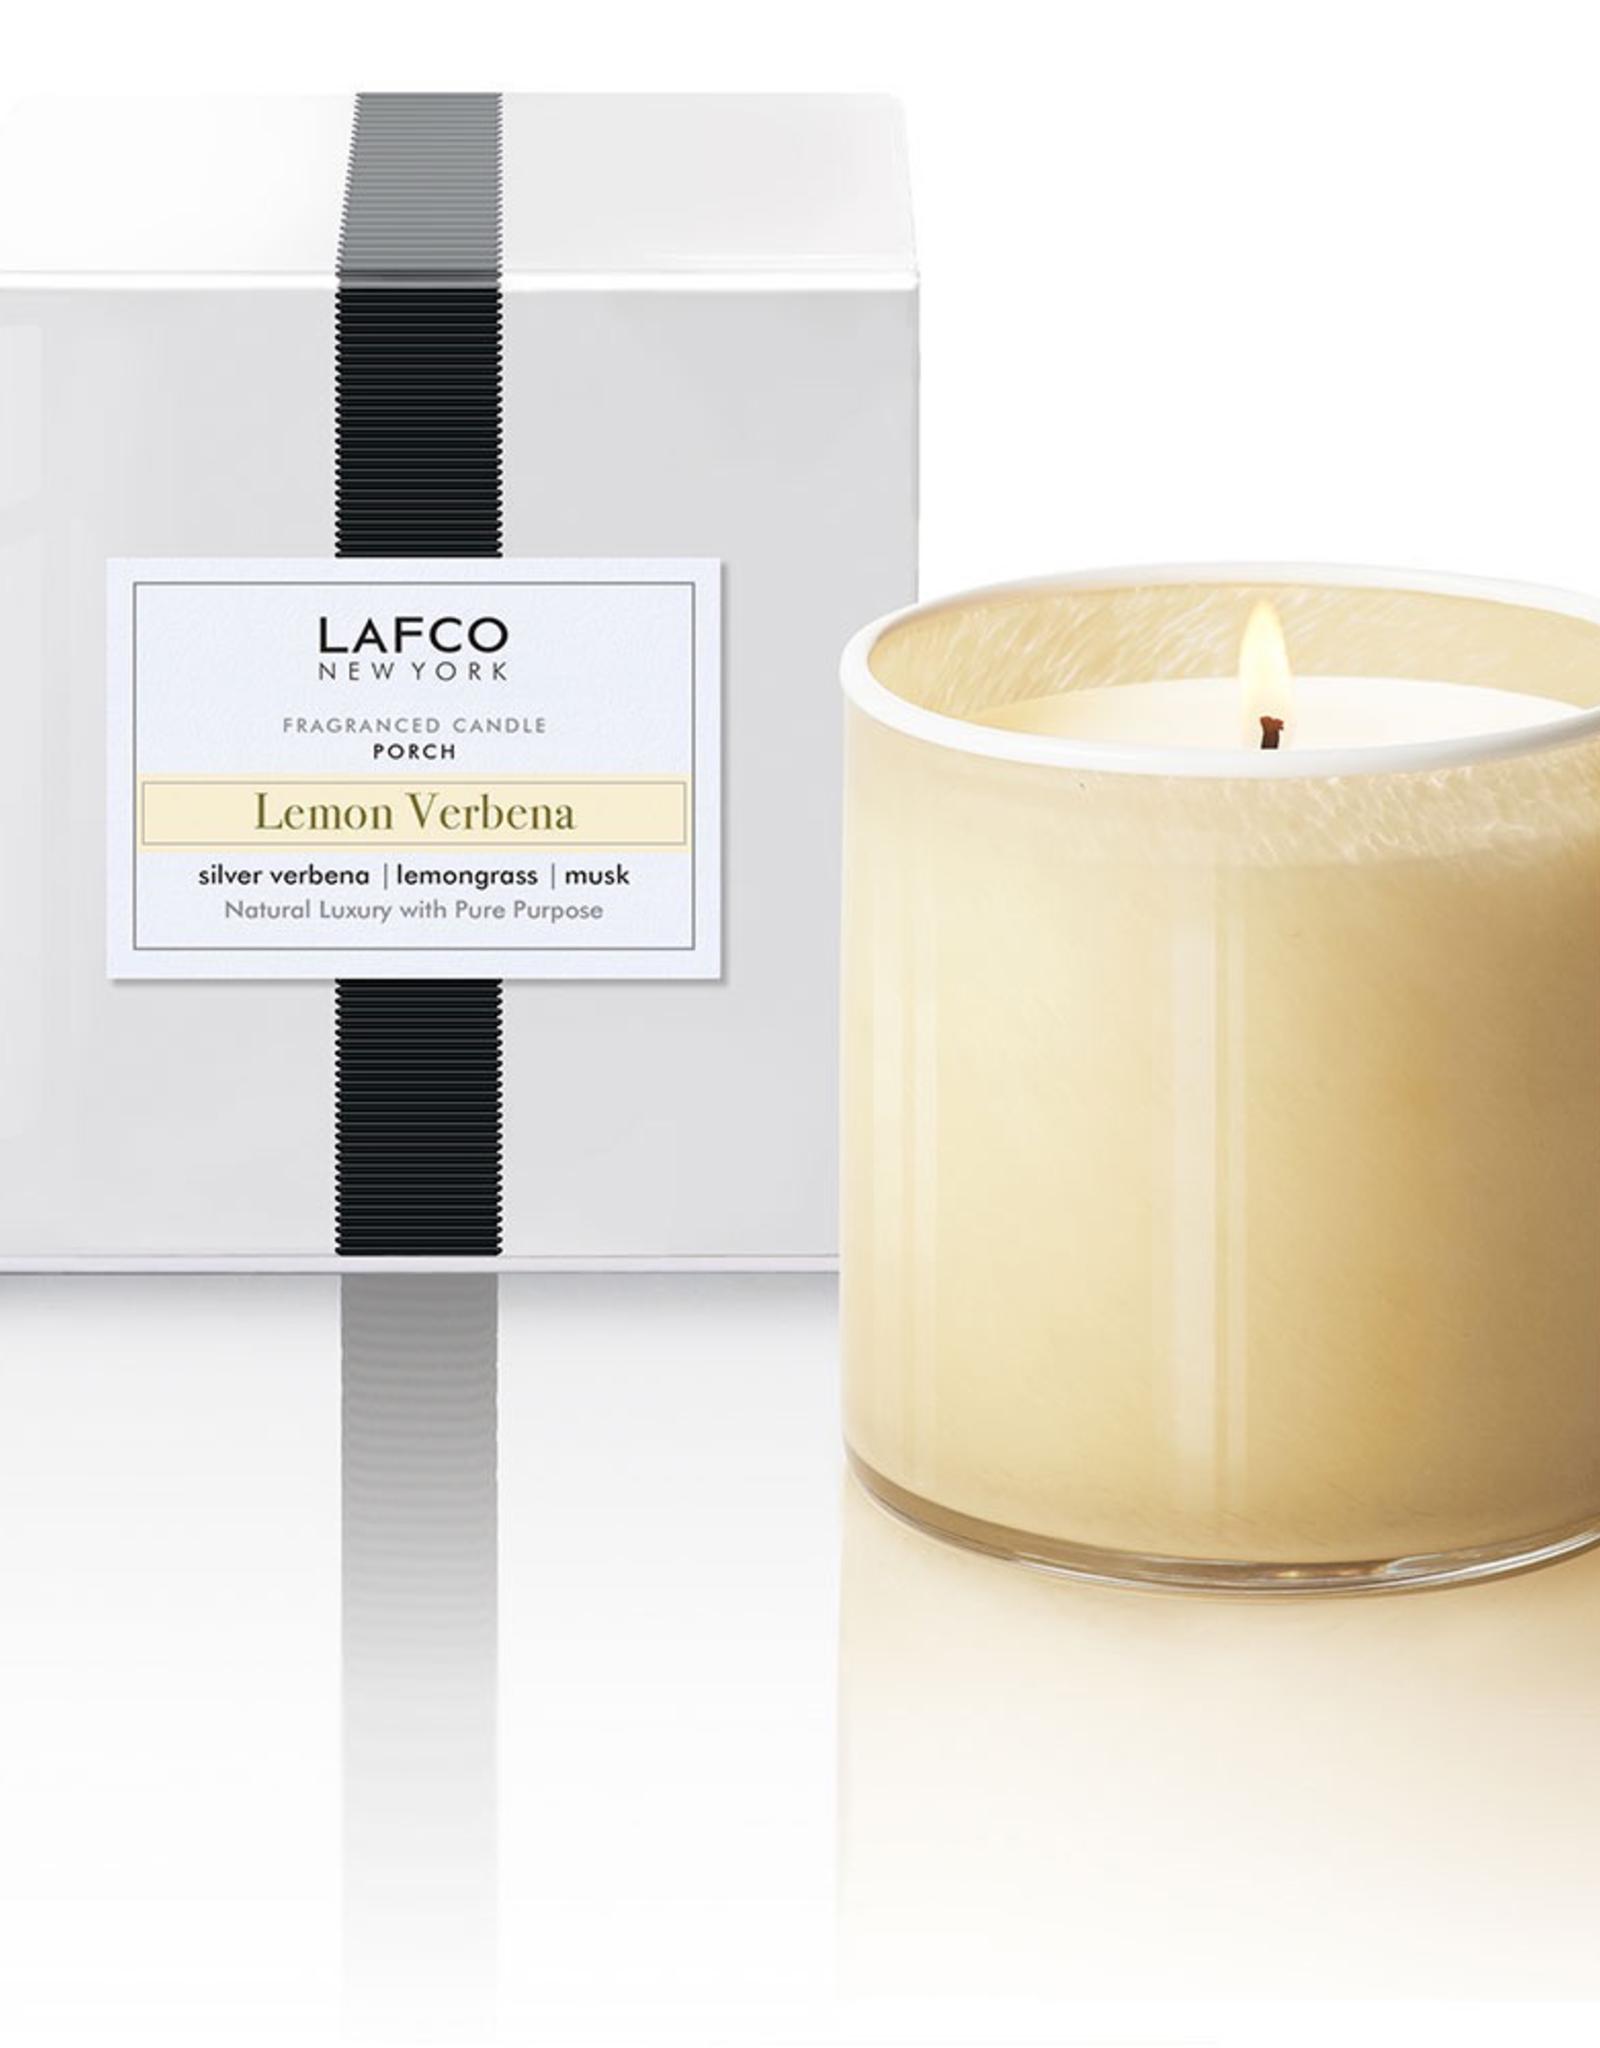 Lemon Verbena Porch Lafco Candle